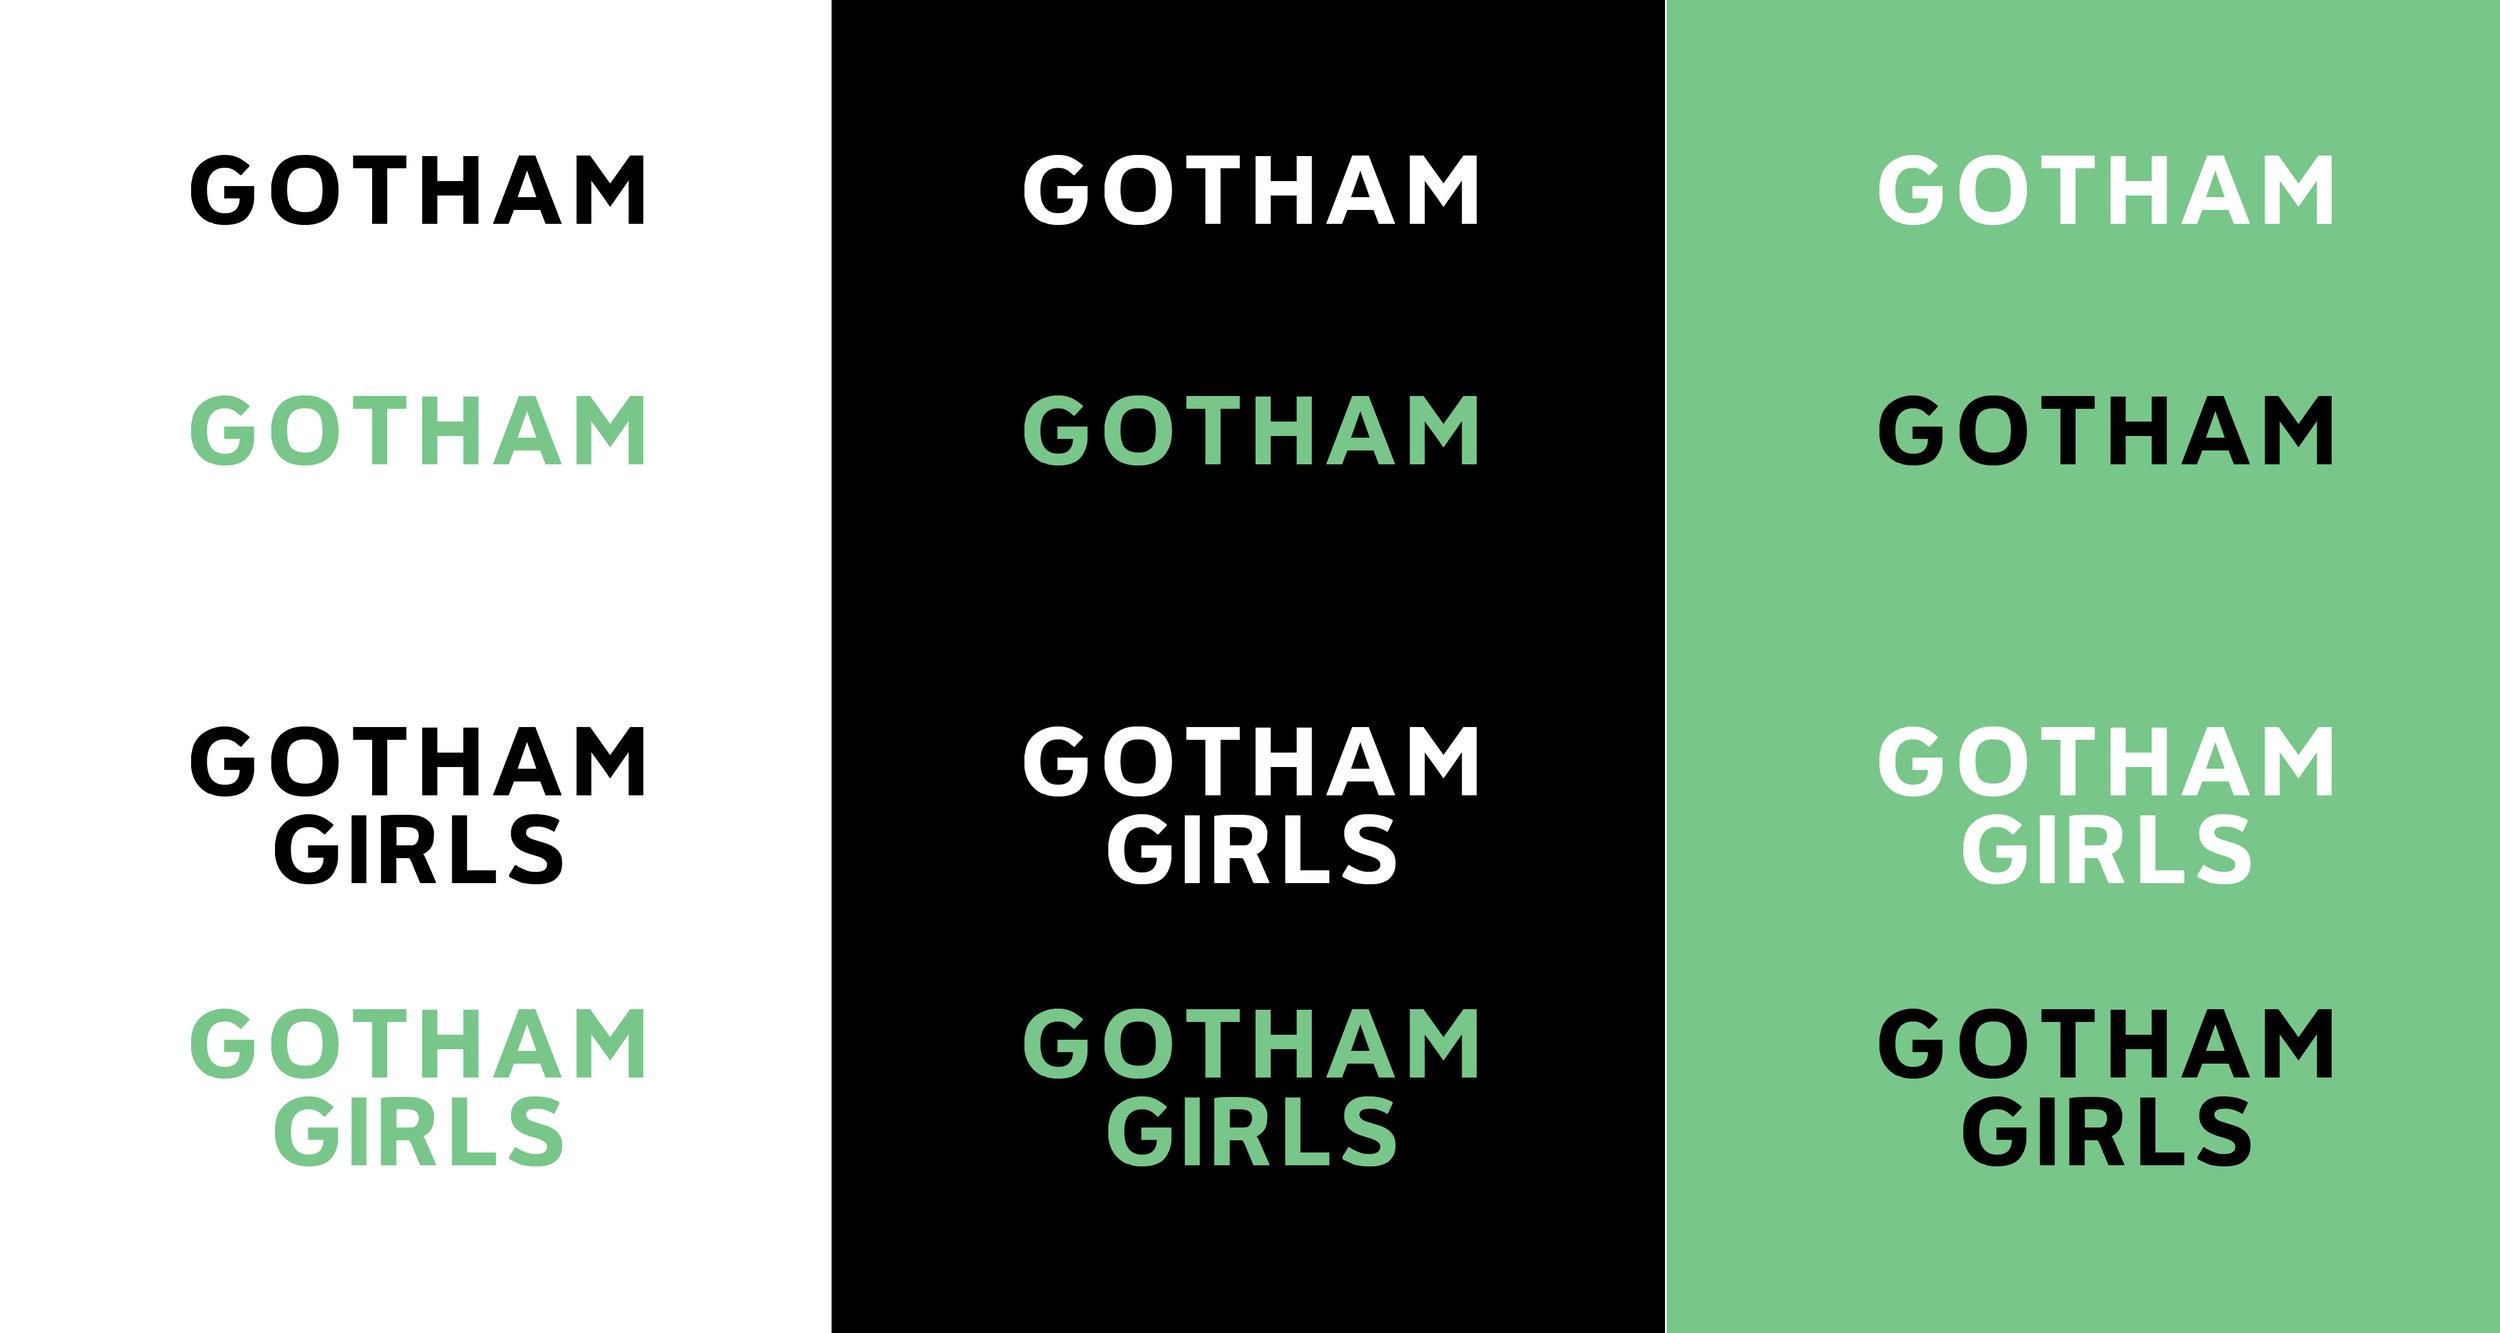 Gotham Girls Website6.jpg